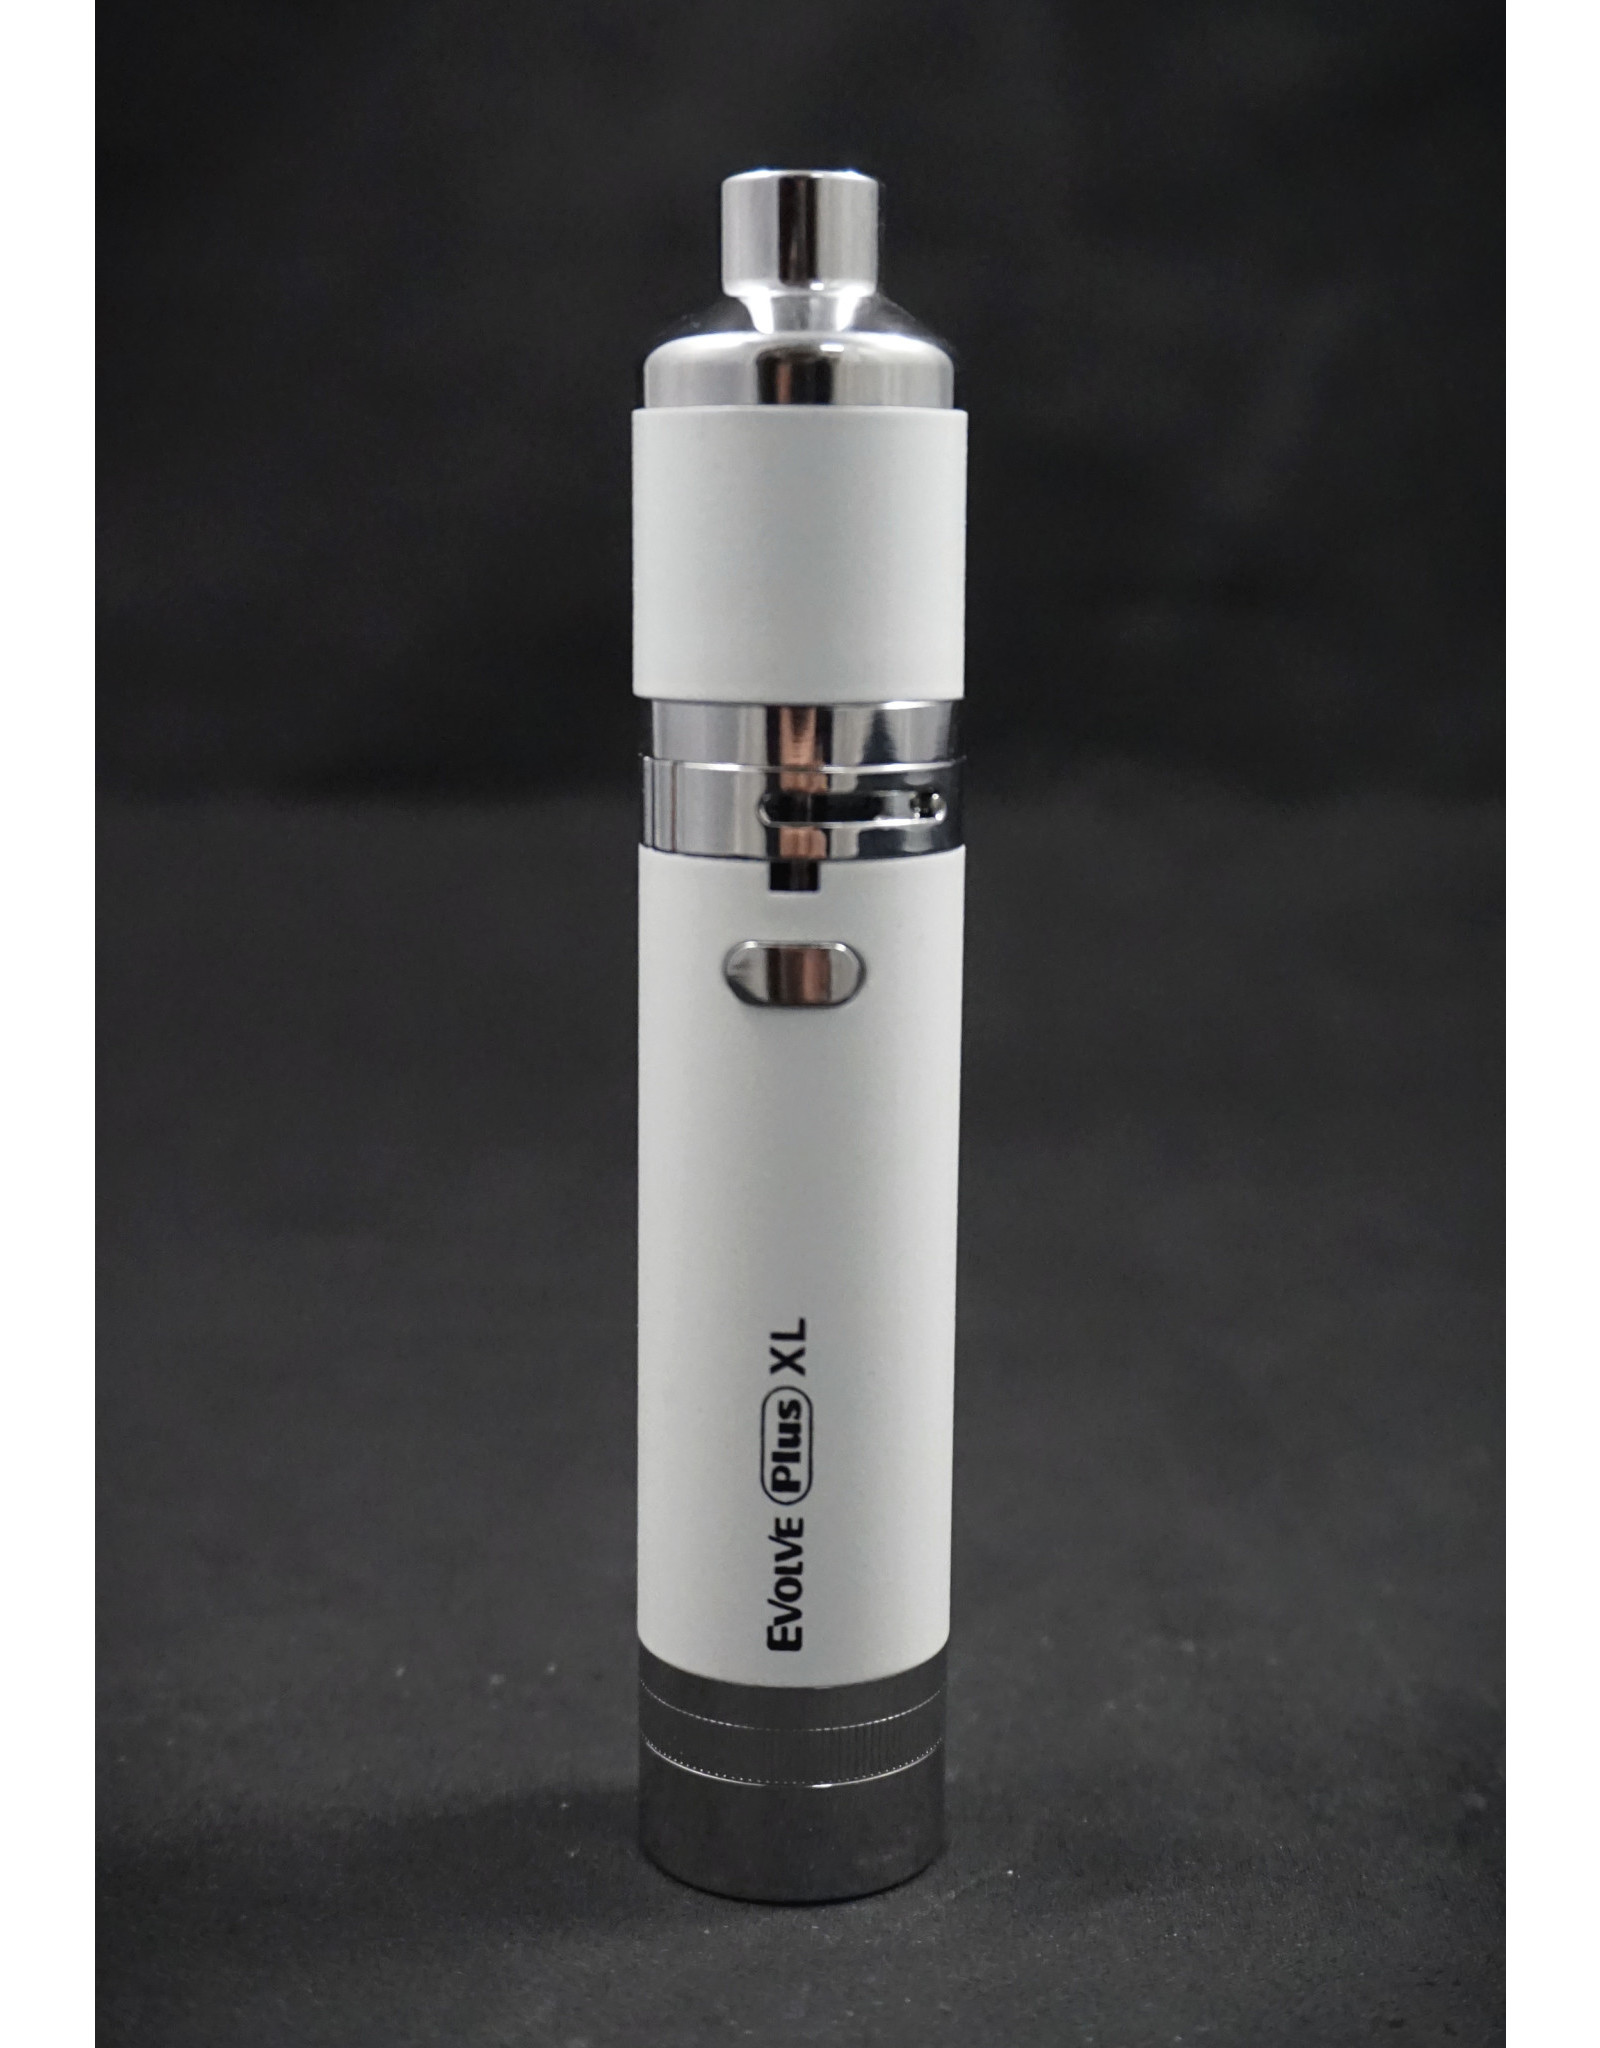 Yocan Yocan Evolve Plus XL - Silver